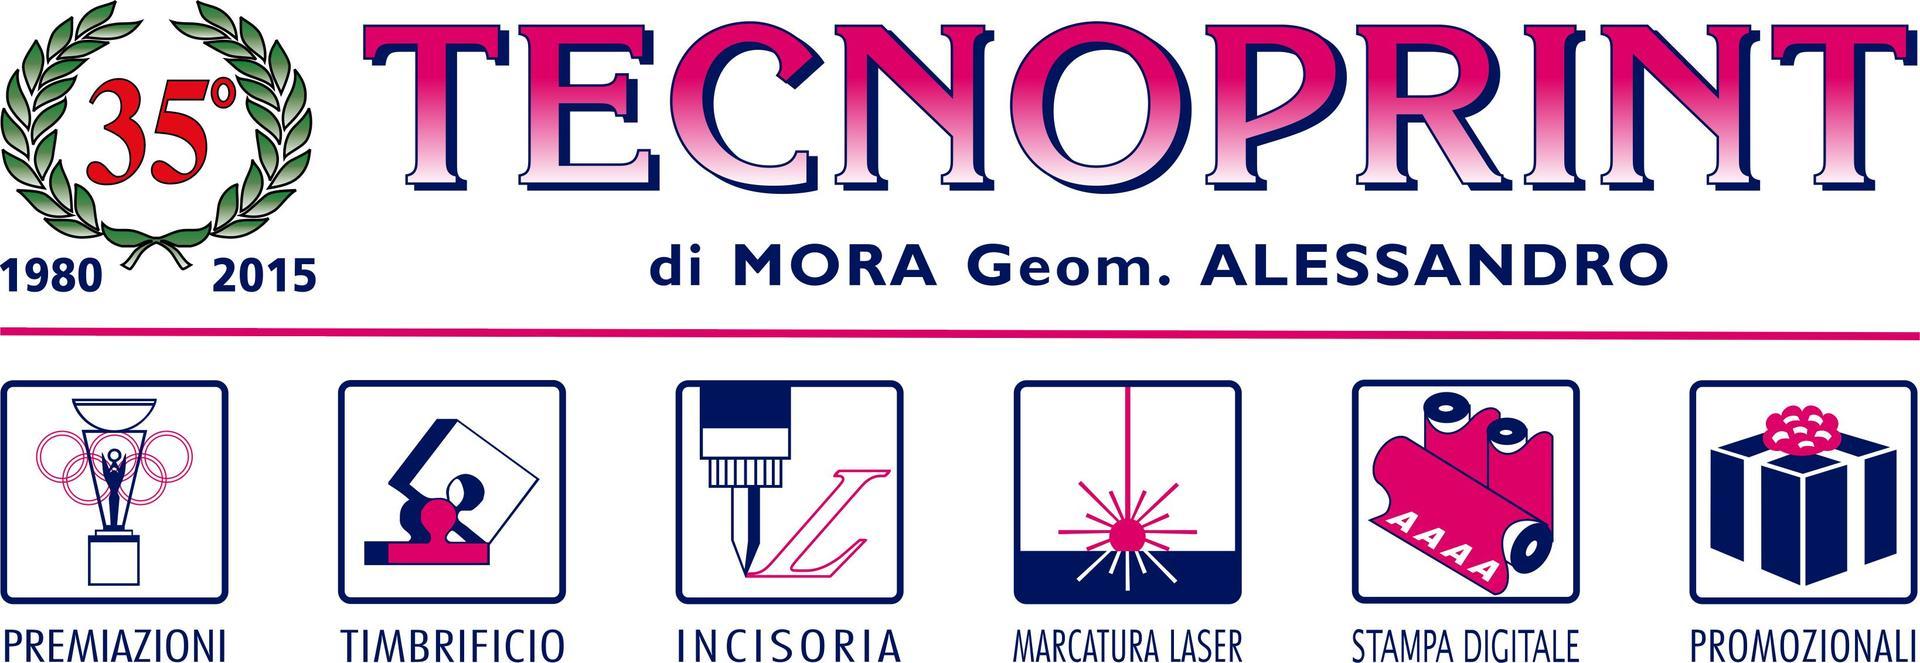 TECNOPRINT - TIMBRI COPPE E TROFEI - LOGO